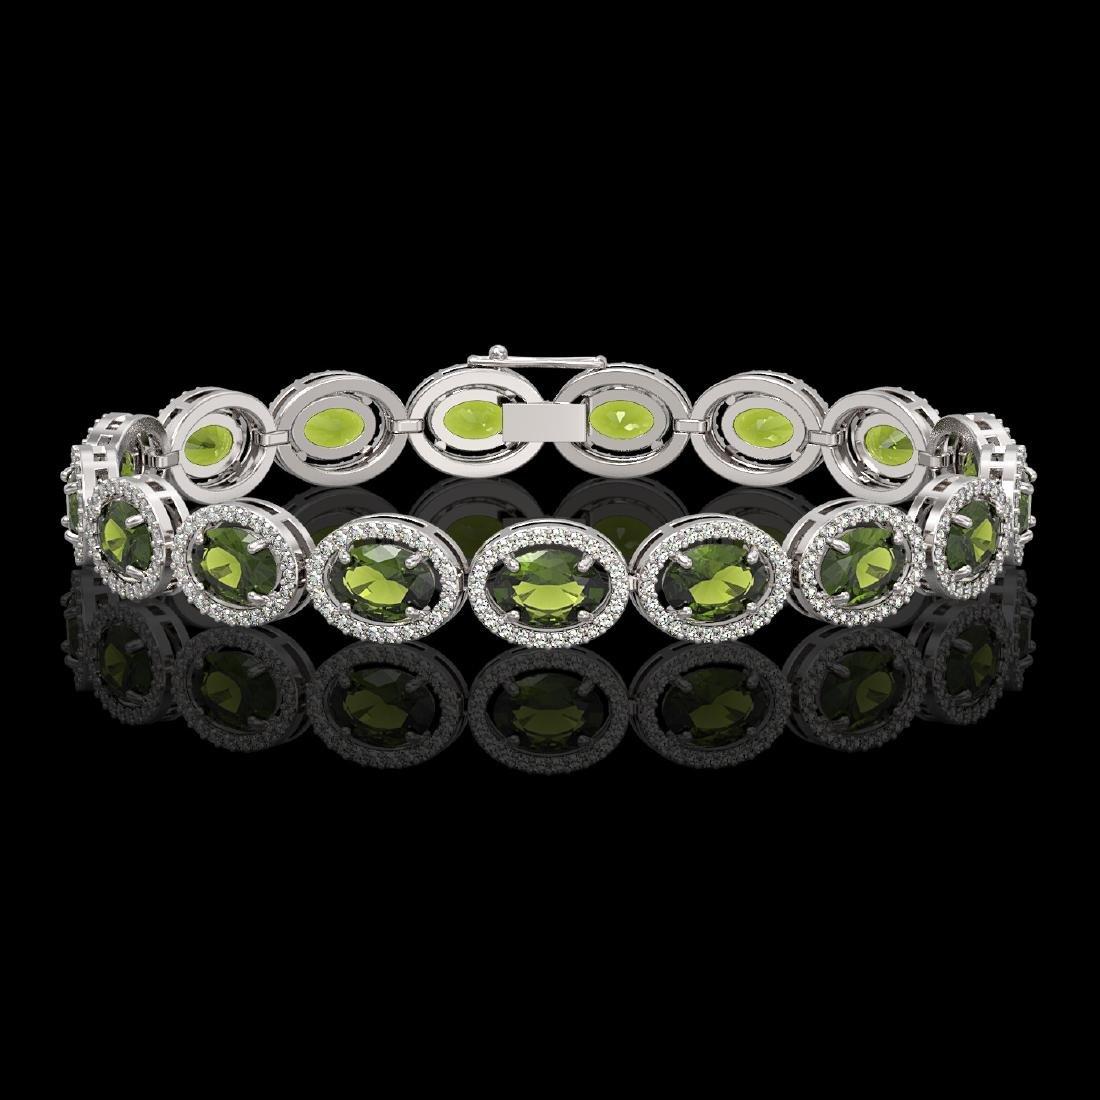 21.71 CTW Tourmaline & Diamond Halo Bracelet 10K White